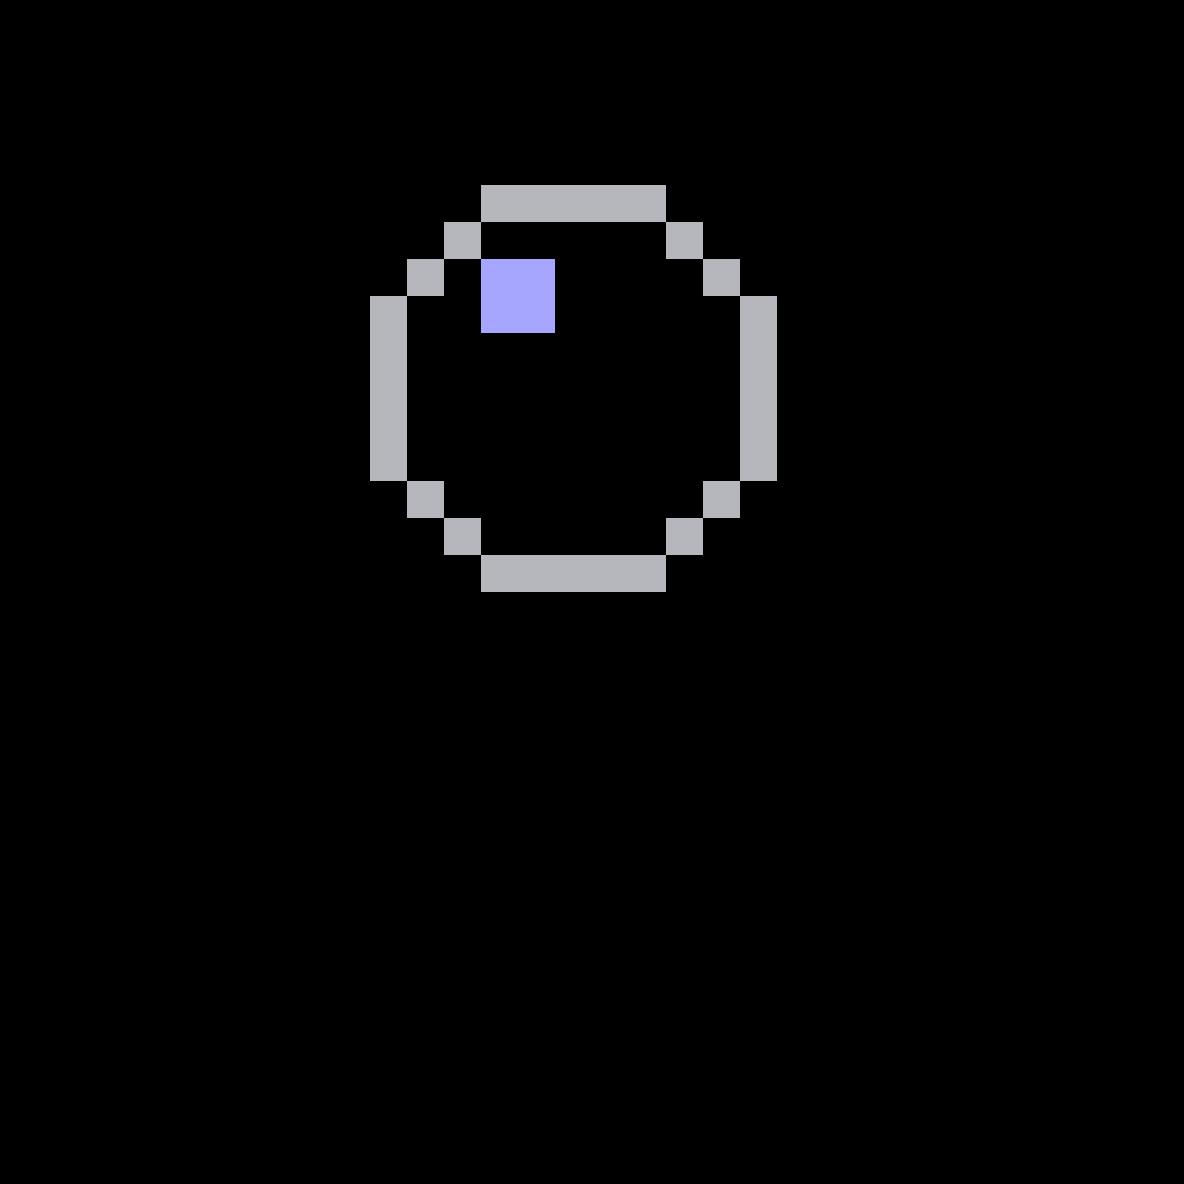 bubble by Pixel-Lil